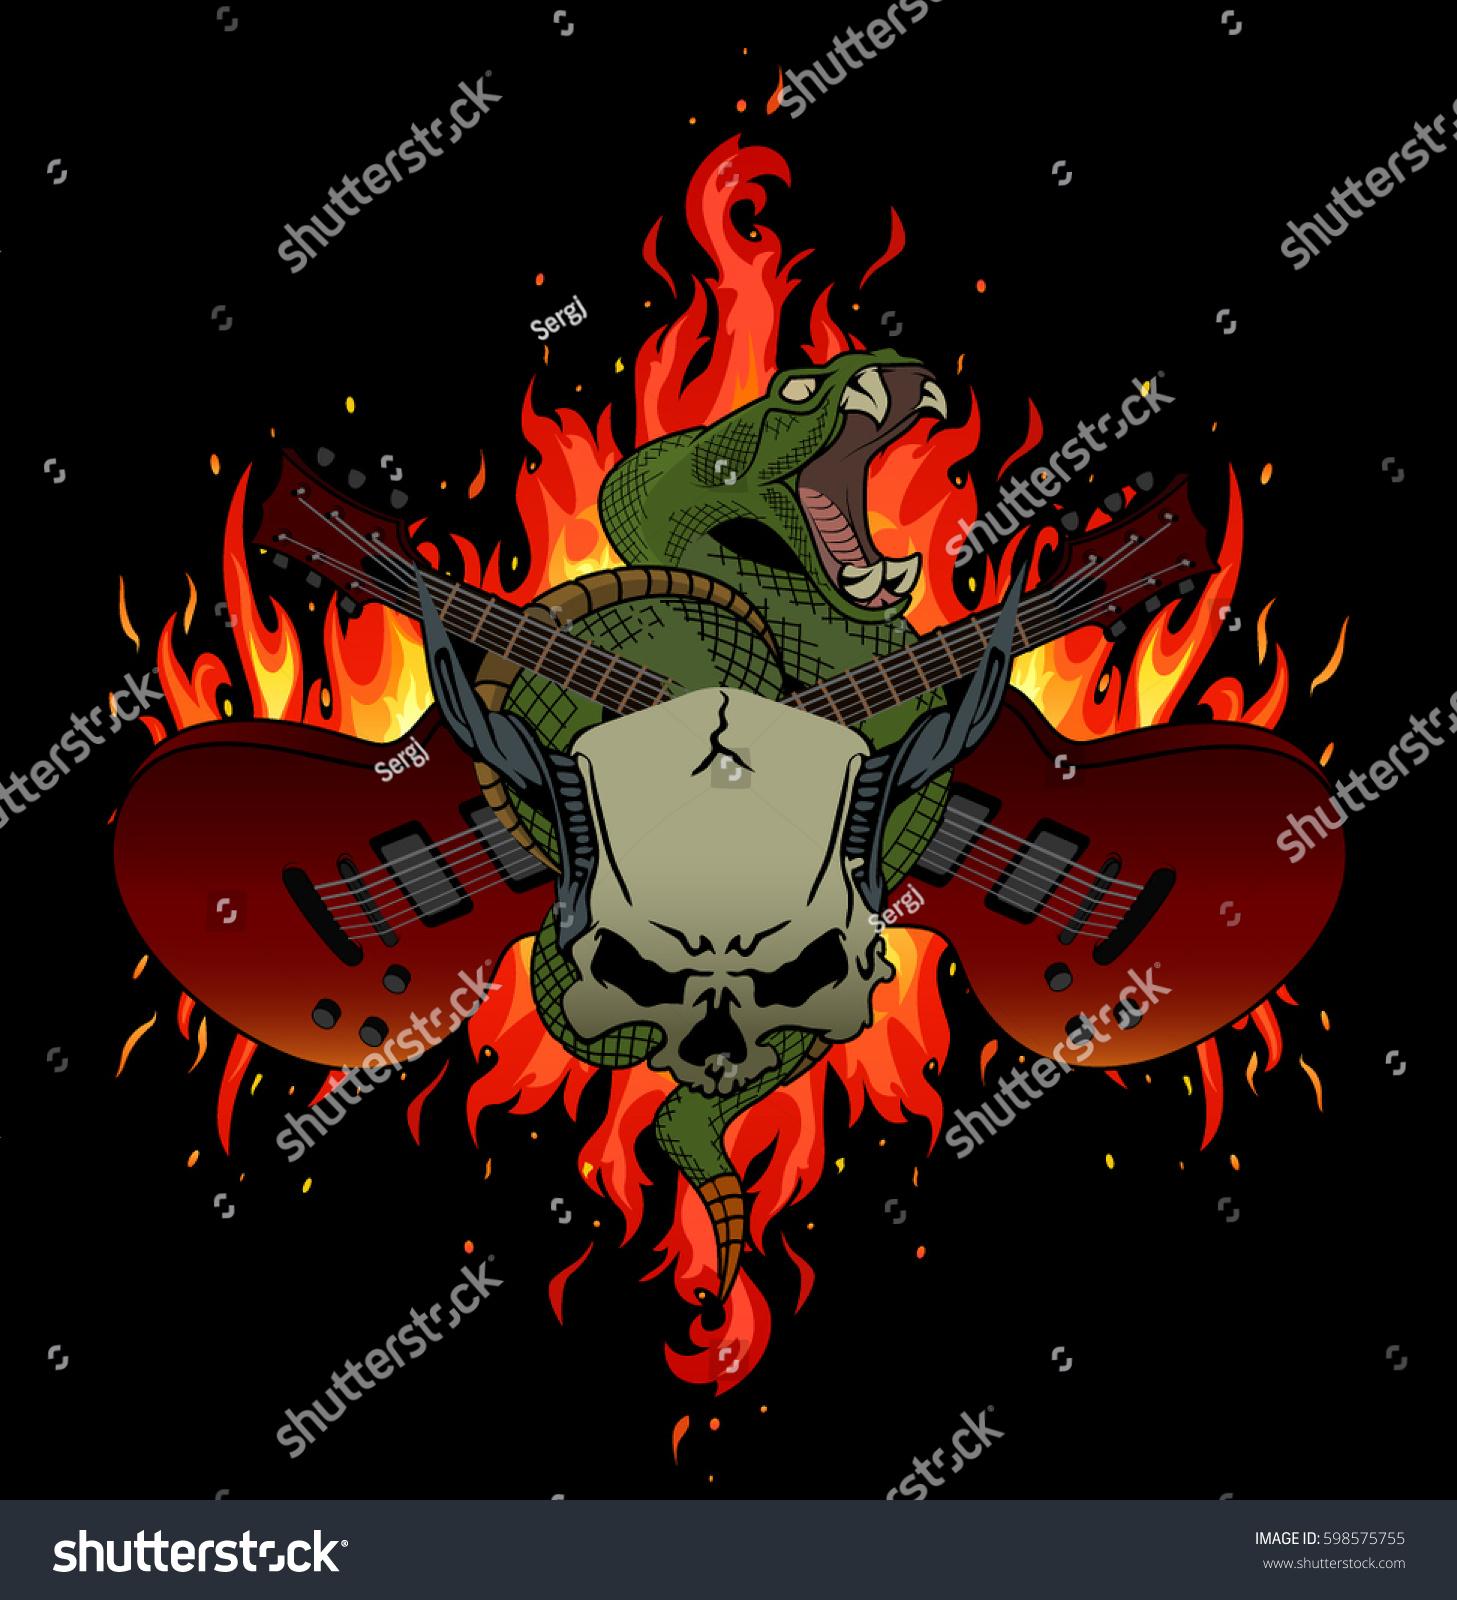 Rock Music Festival Vector Illustration Flames Stock Vector (Royalty ...